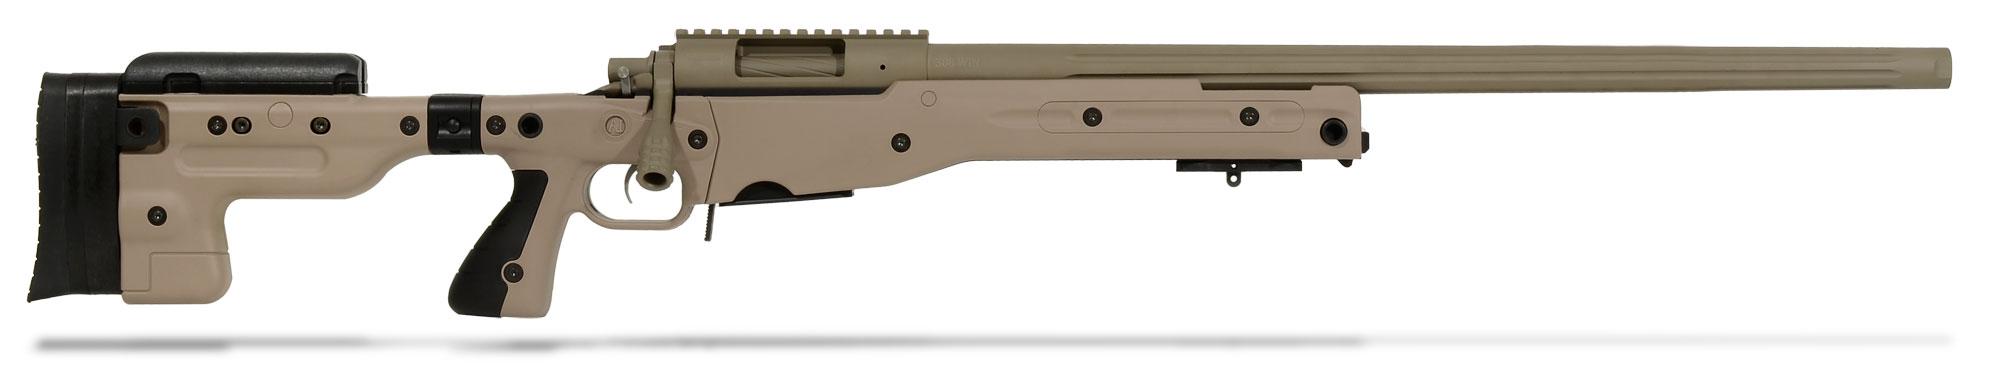 Surgeon Rifle Scalpel .308 Winchester FDE Rifle